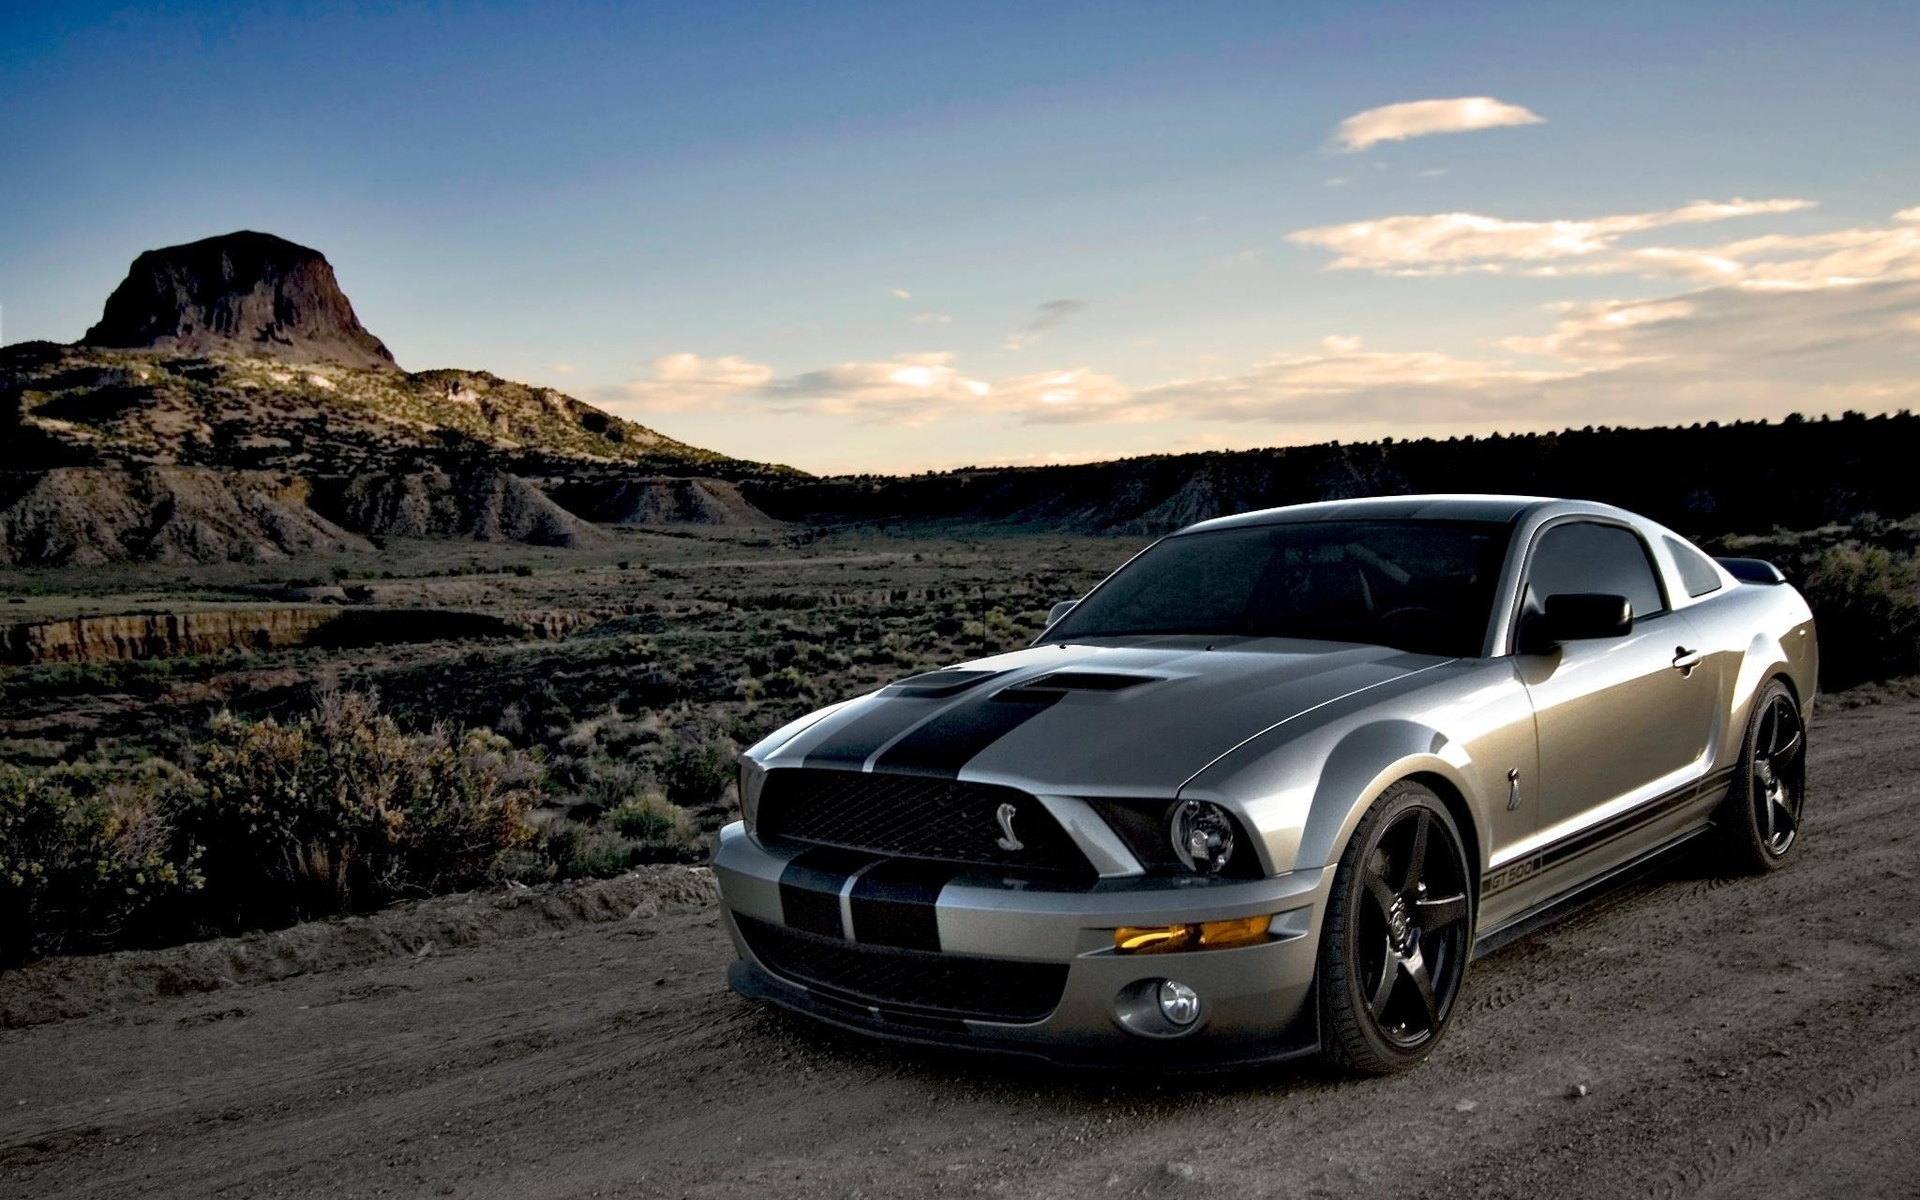 2014 Shelby Gt500 Mustang Desktop Background Screensaver Apps 1920x1200